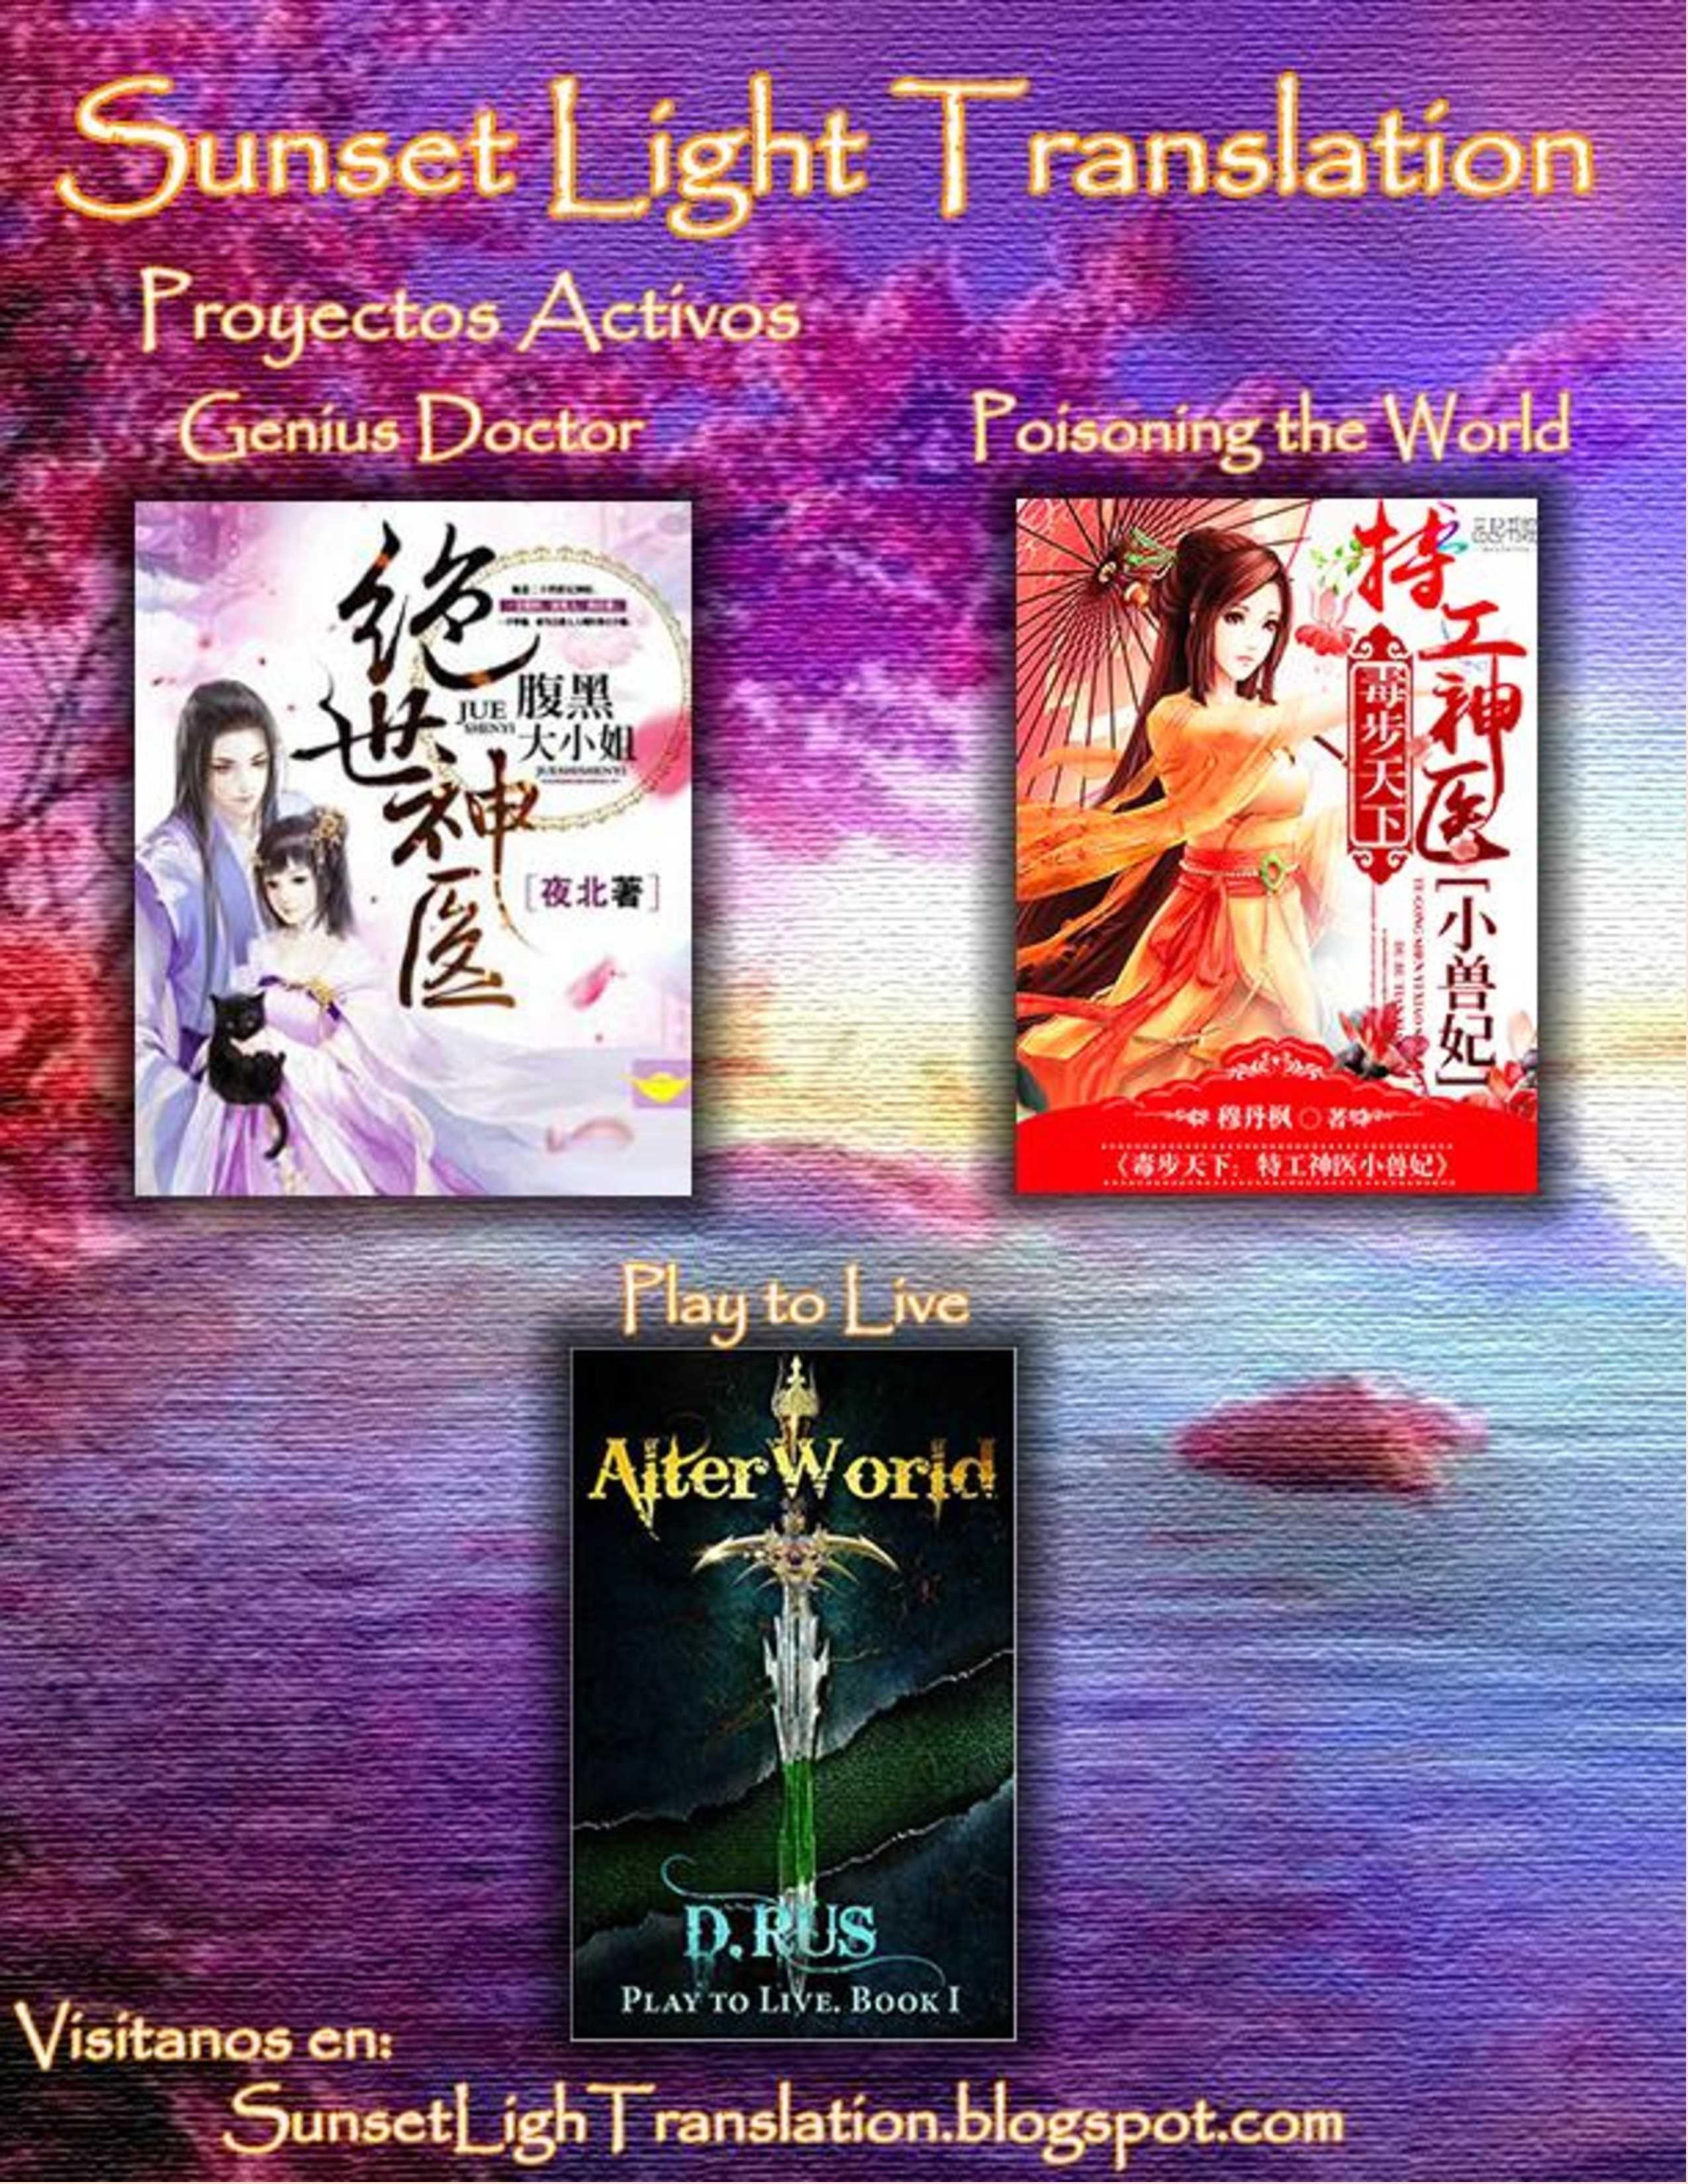 https://c5.ninemanga.com/es_manga/pic2/1/20097/513320/27e7dced334801d01656ac30ca4f1bb4.jpg Page 1